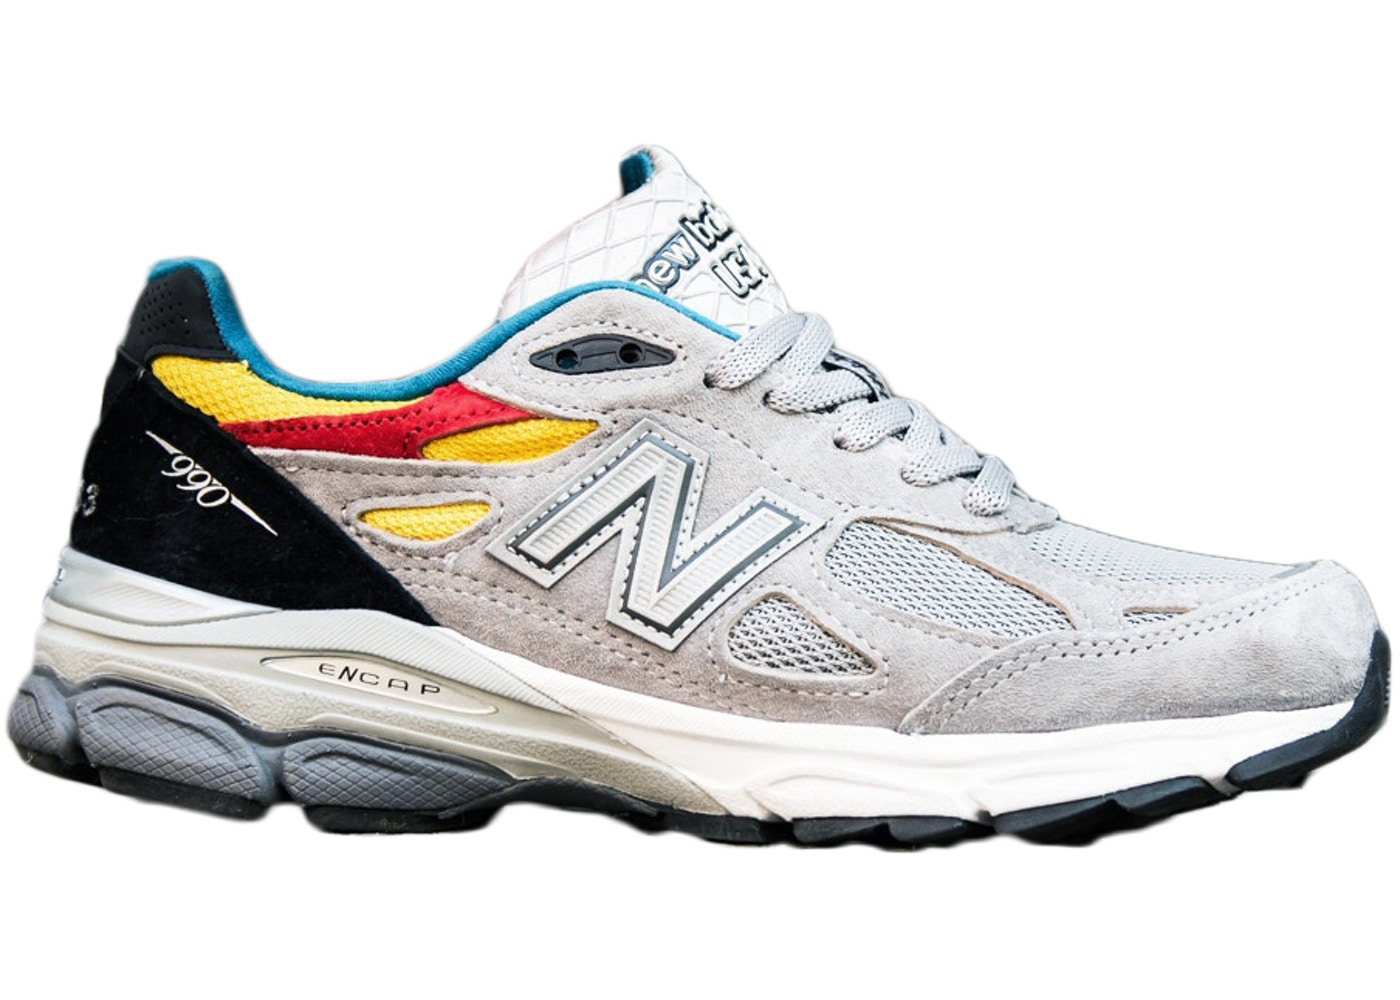 buy popular 656e5 2a4b4 New Balance Shoes - Highest Bid